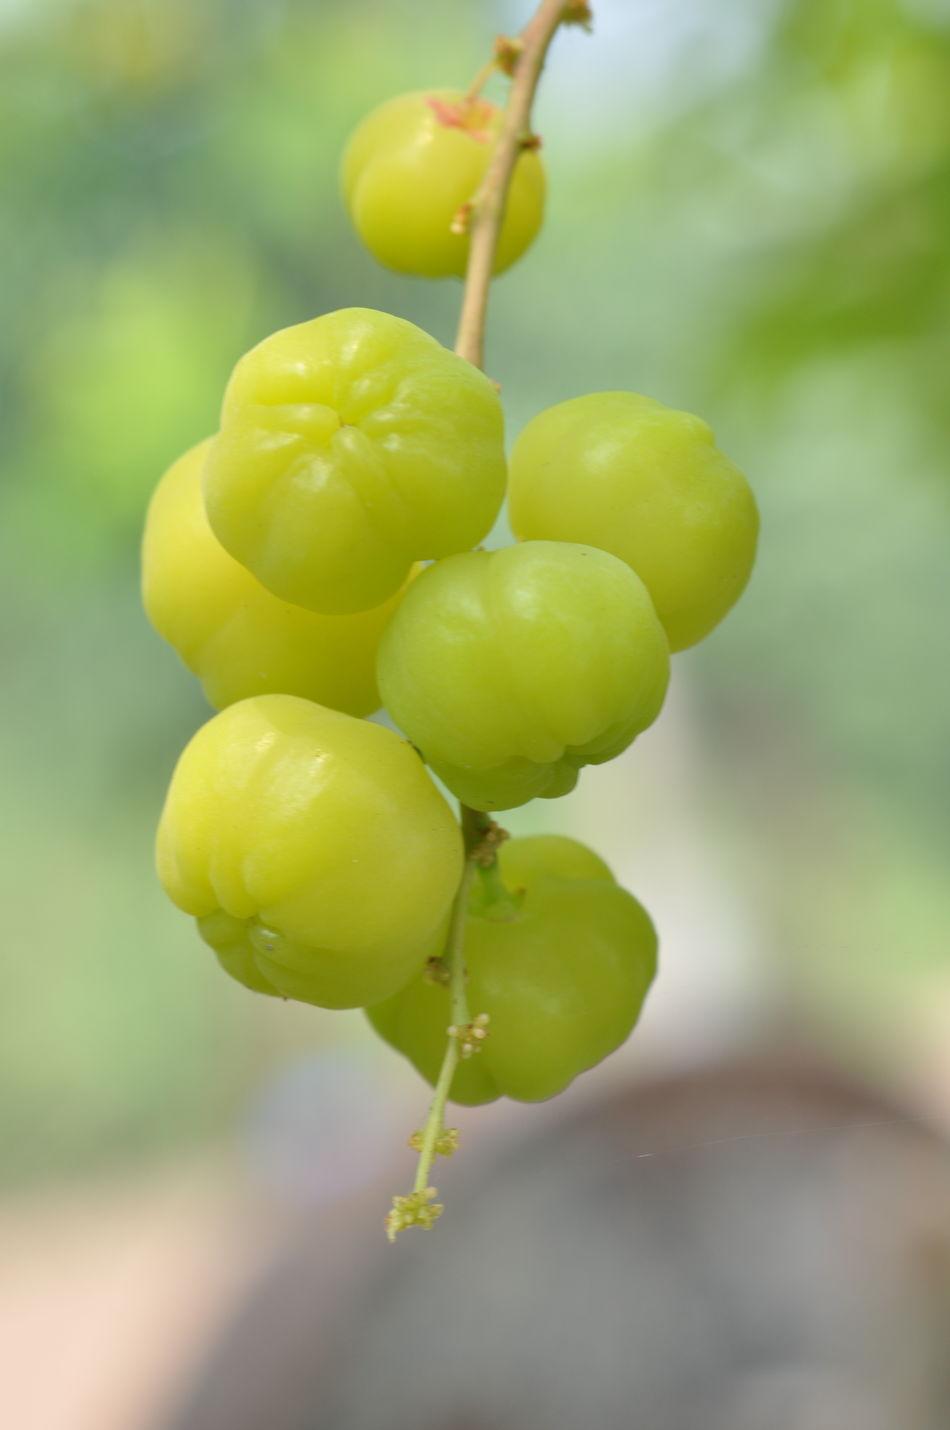 Close up Star goodeberry fruit Fruit Food Sour Fresh Star Gooseberry Green Vitamin Graden Background Close-up